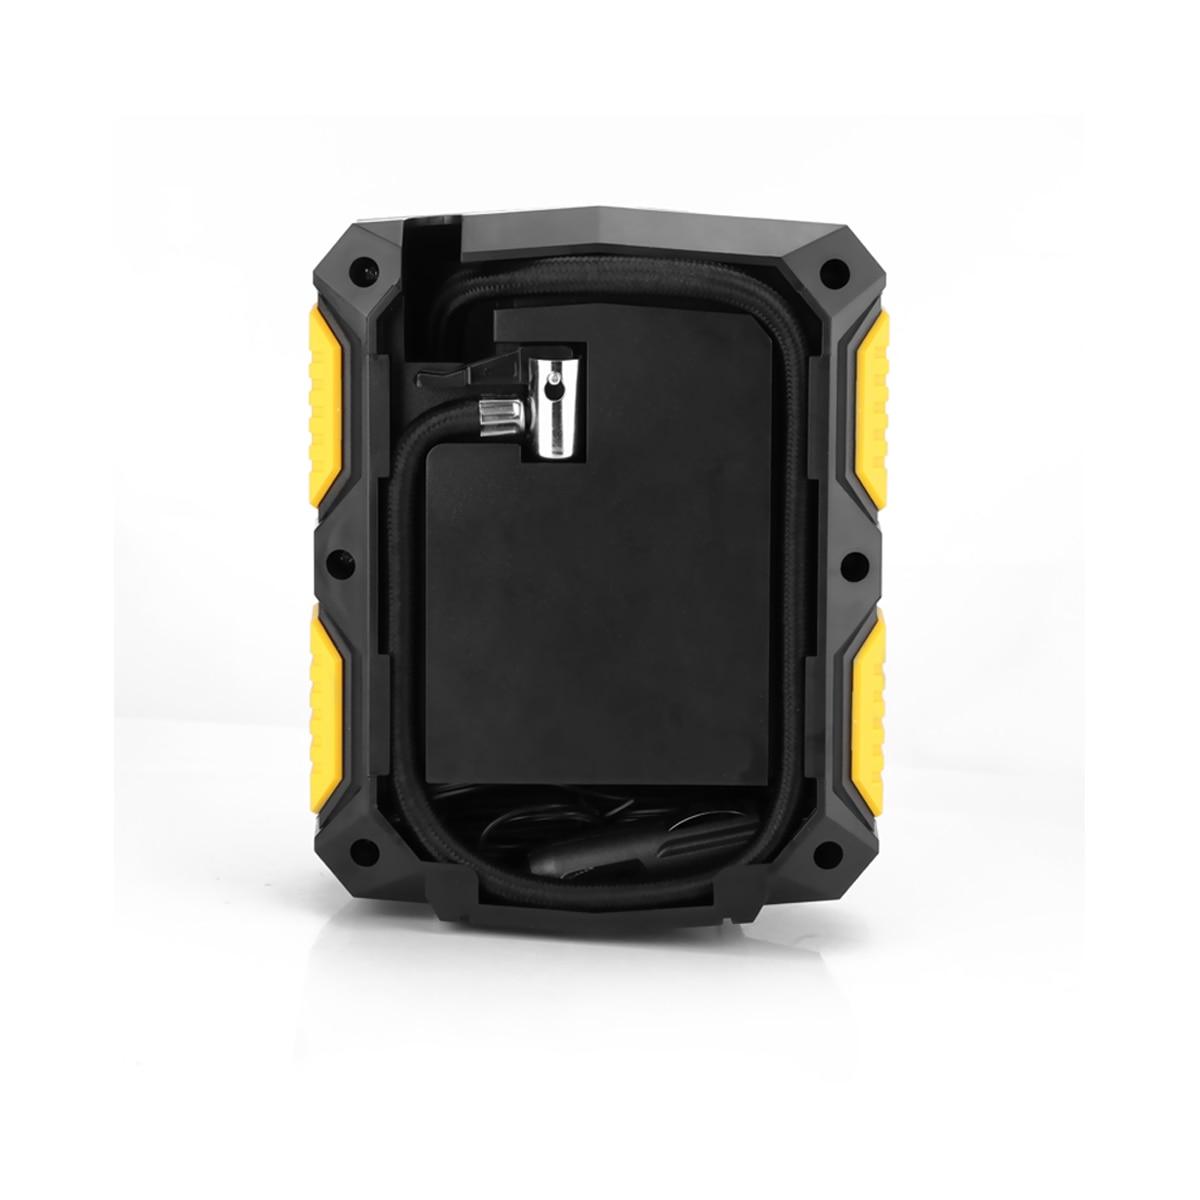 Onever Portable Tire Air Compressor 9